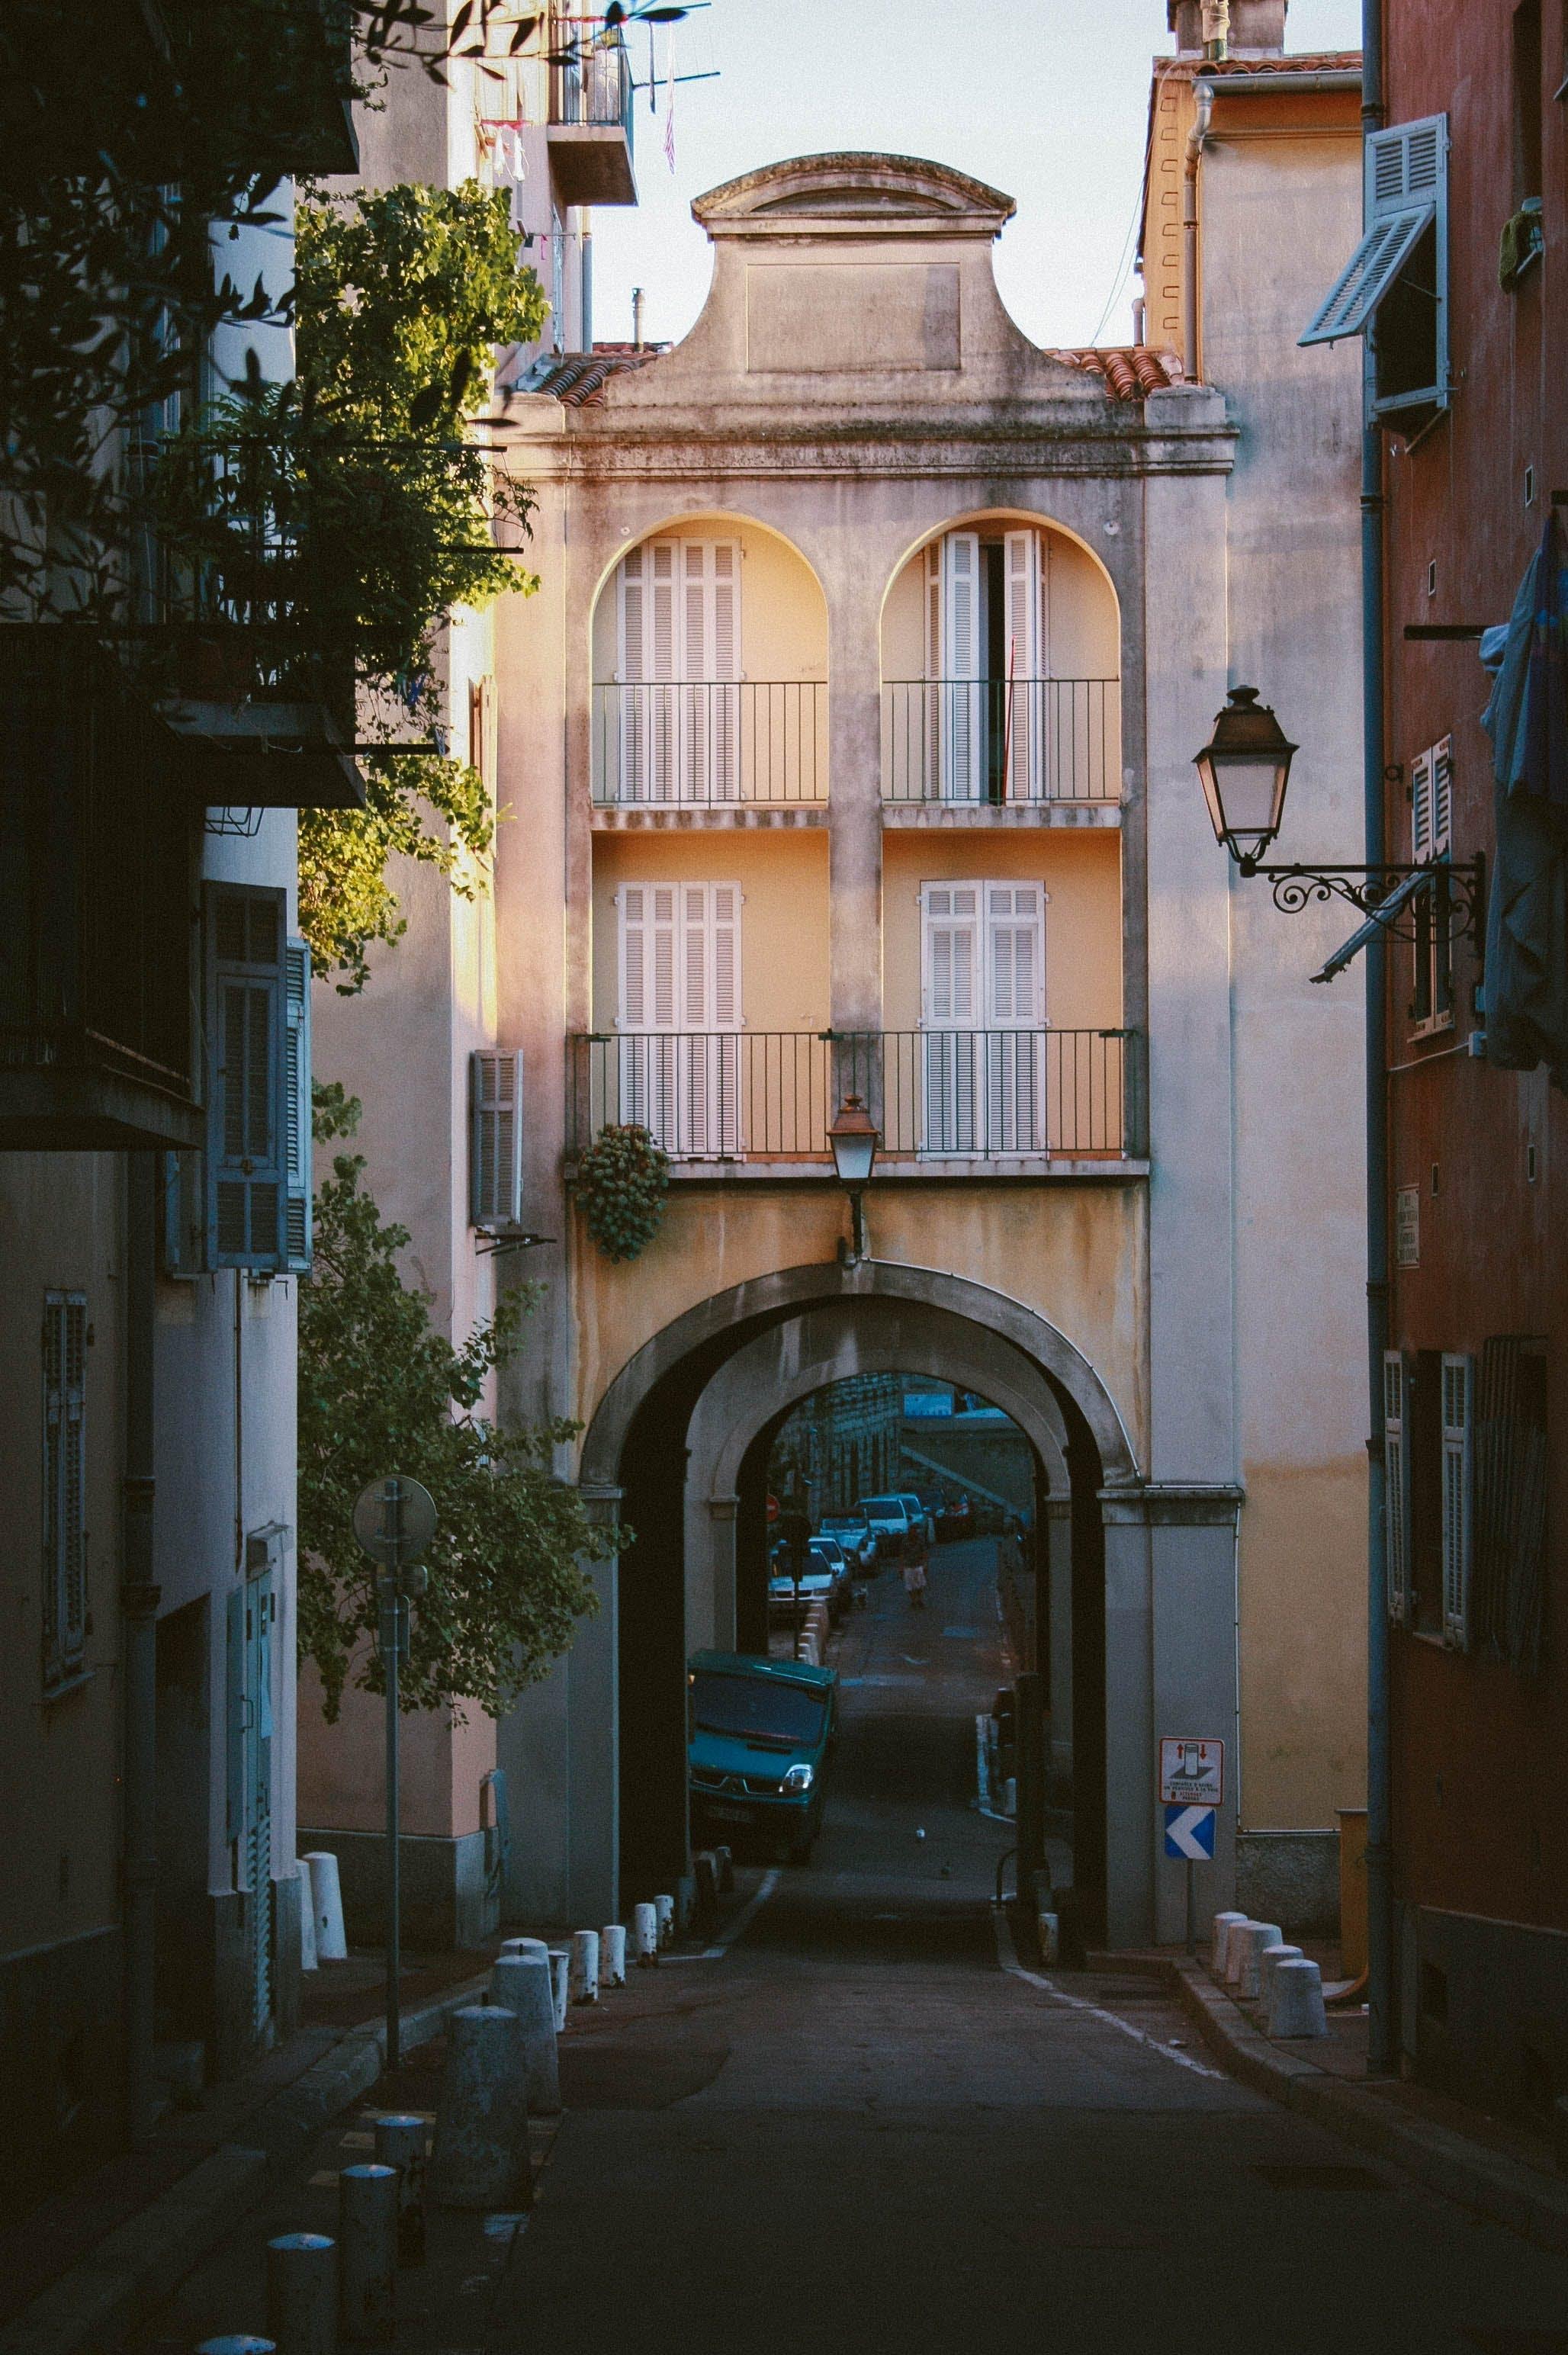 Gratis lagerfoto af arkitektur, bue, by, bygning